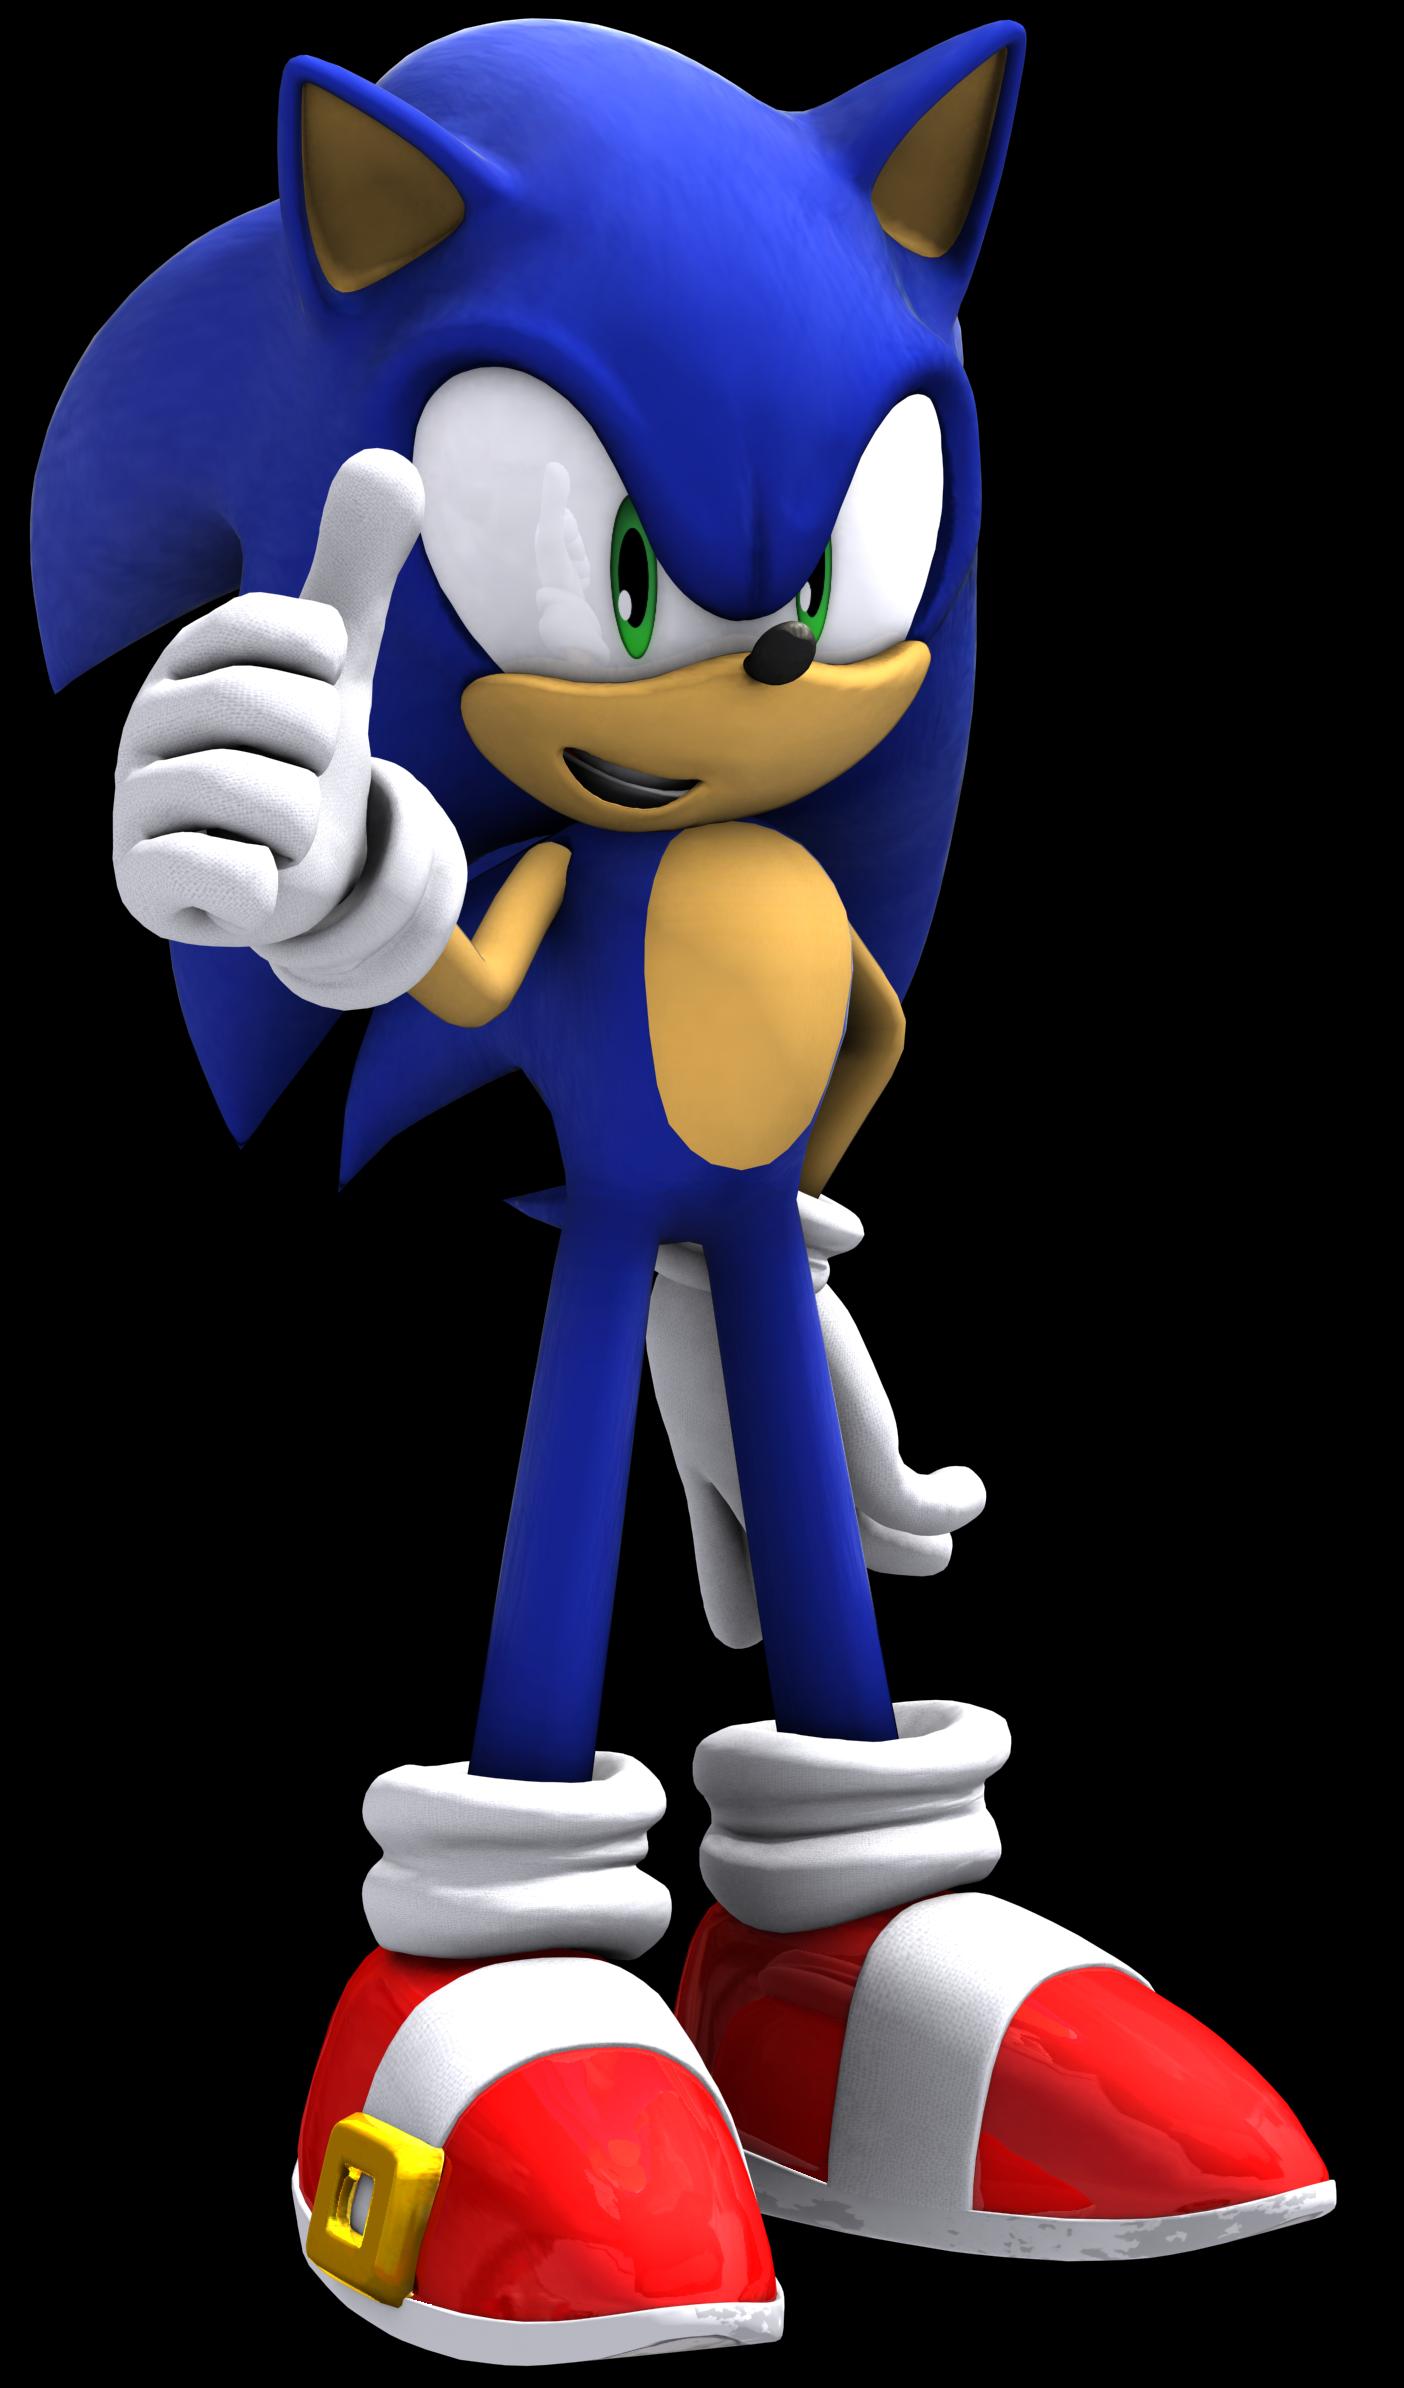 Imagen - Sonic the Hedgehog.png   Wiki Bajoterra   FANDOM ...